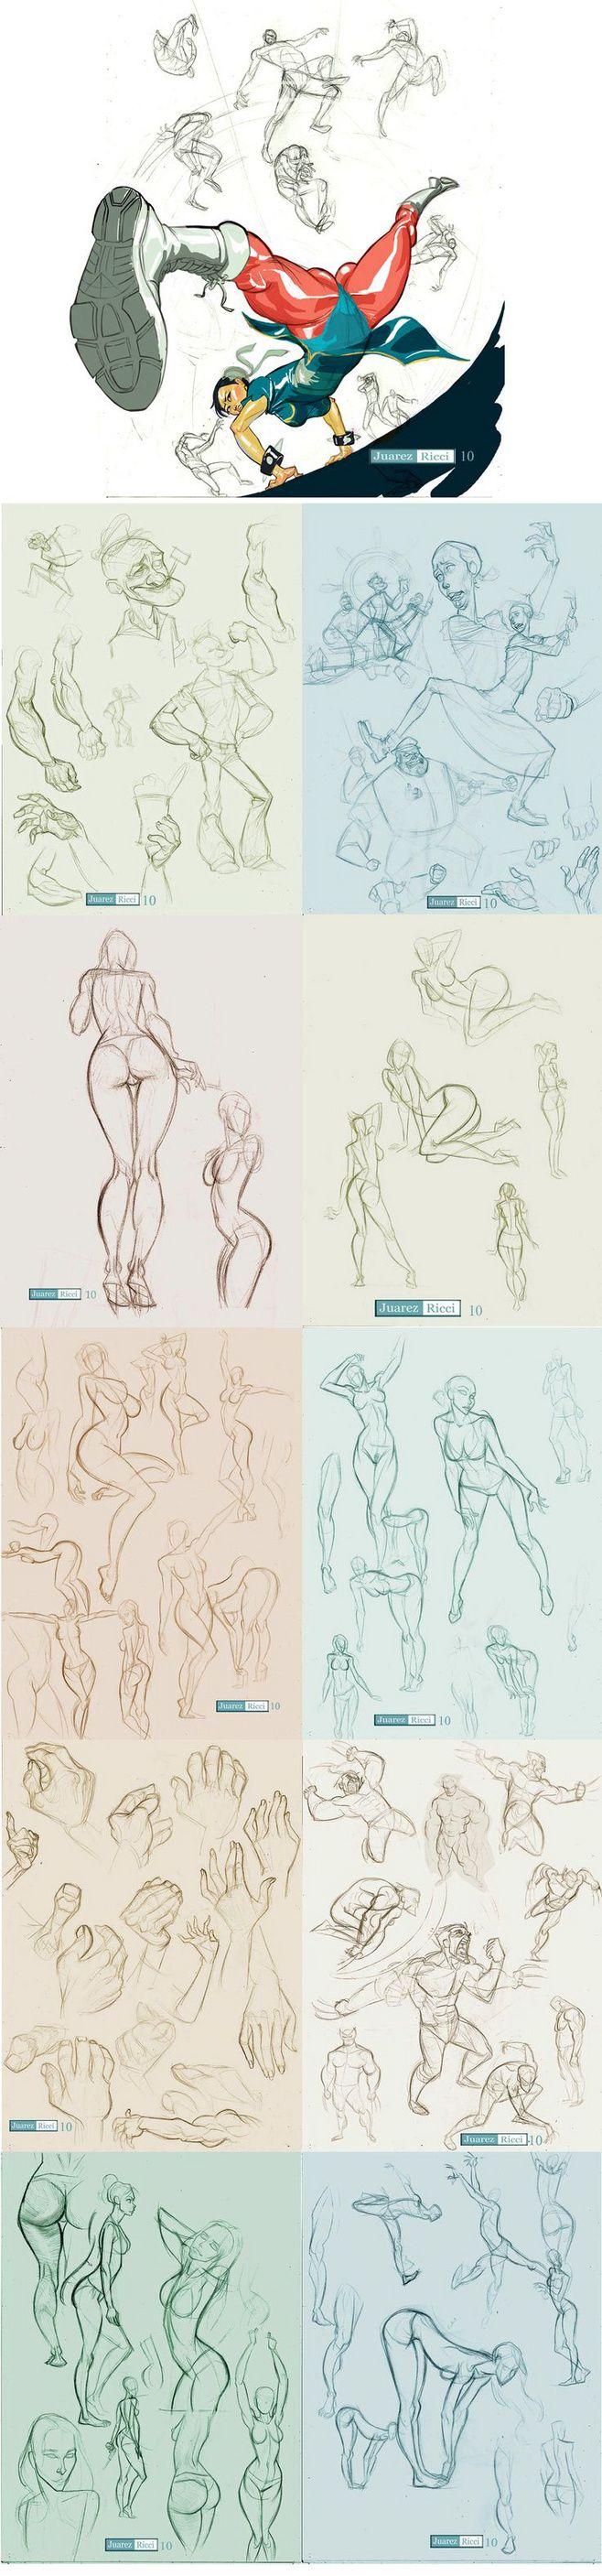 Dreams collection to paint original painting tutorial (359 Figure) _ petal illustration via cgpin.com